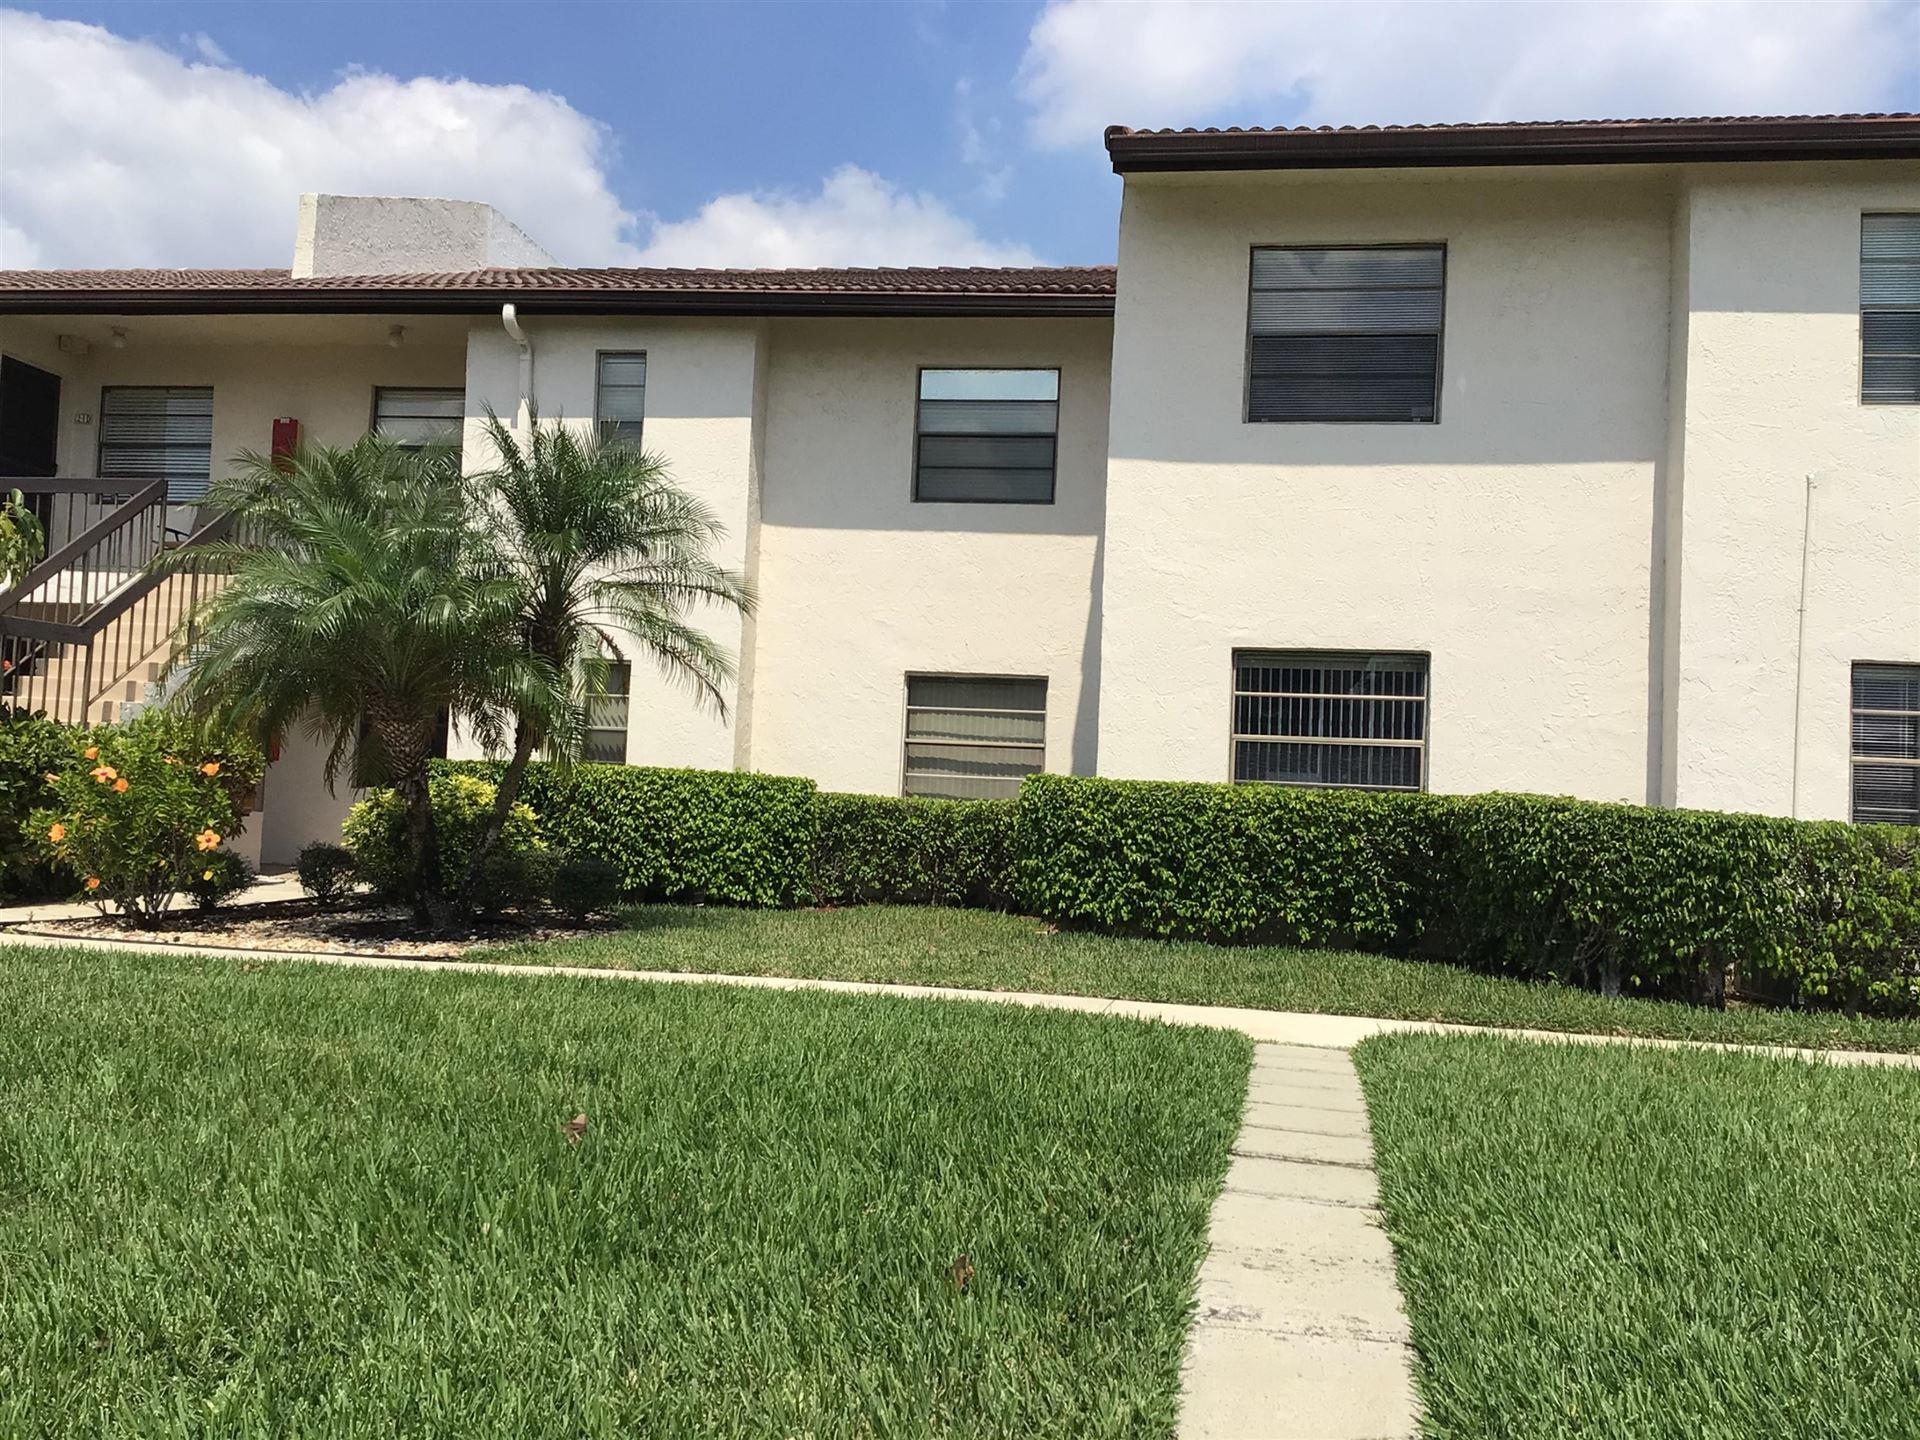 7896 Eastlake Drive E #21-E, Boca Raton, FL 33433 - MLS#: RX-10701888